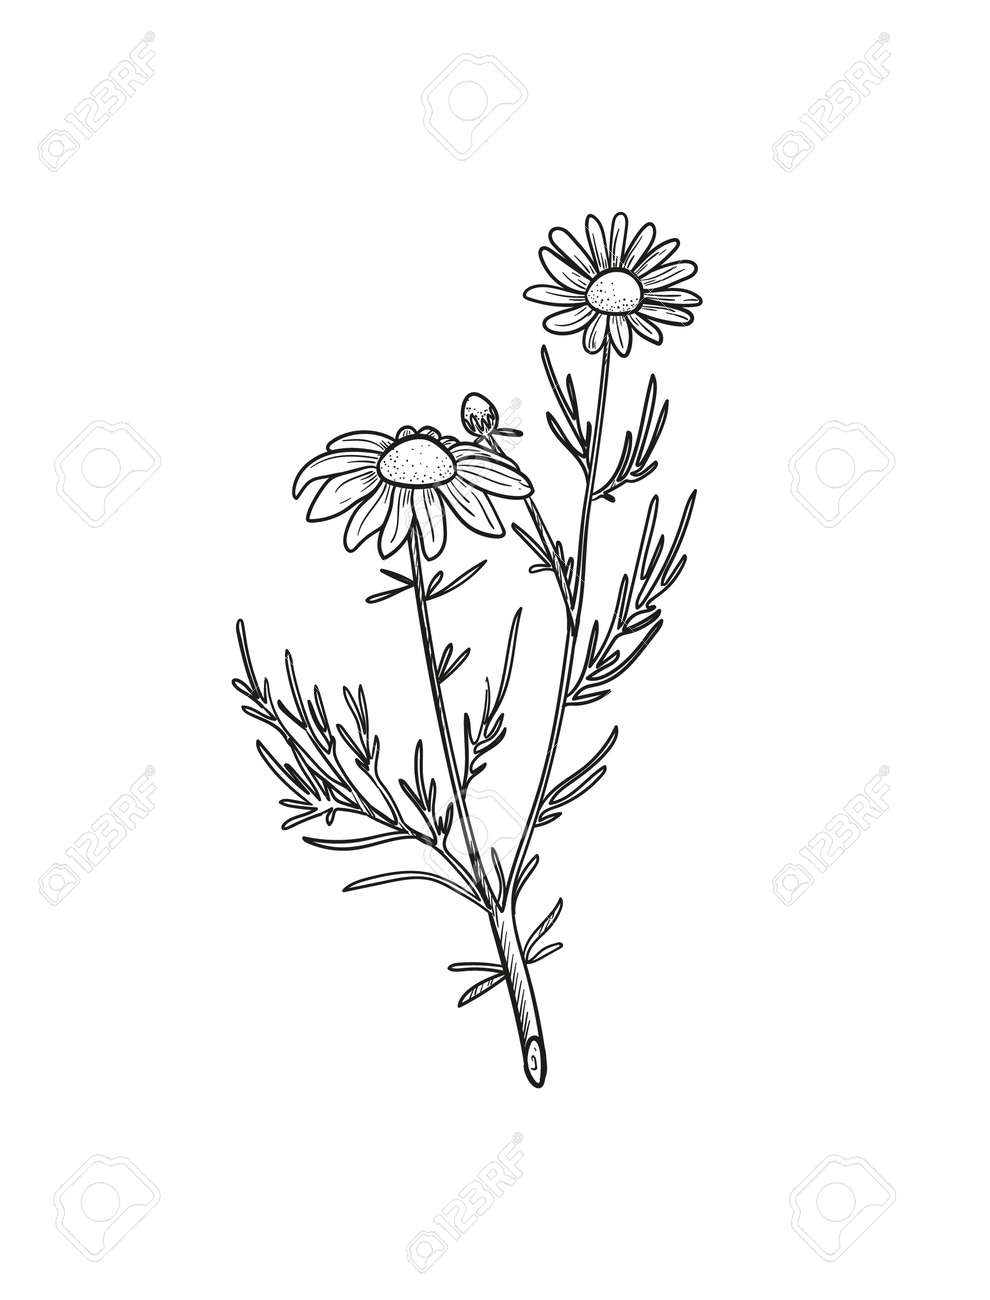 Vector Chamomile sketch. Botanical engraved art daisy flowers. - 167208075